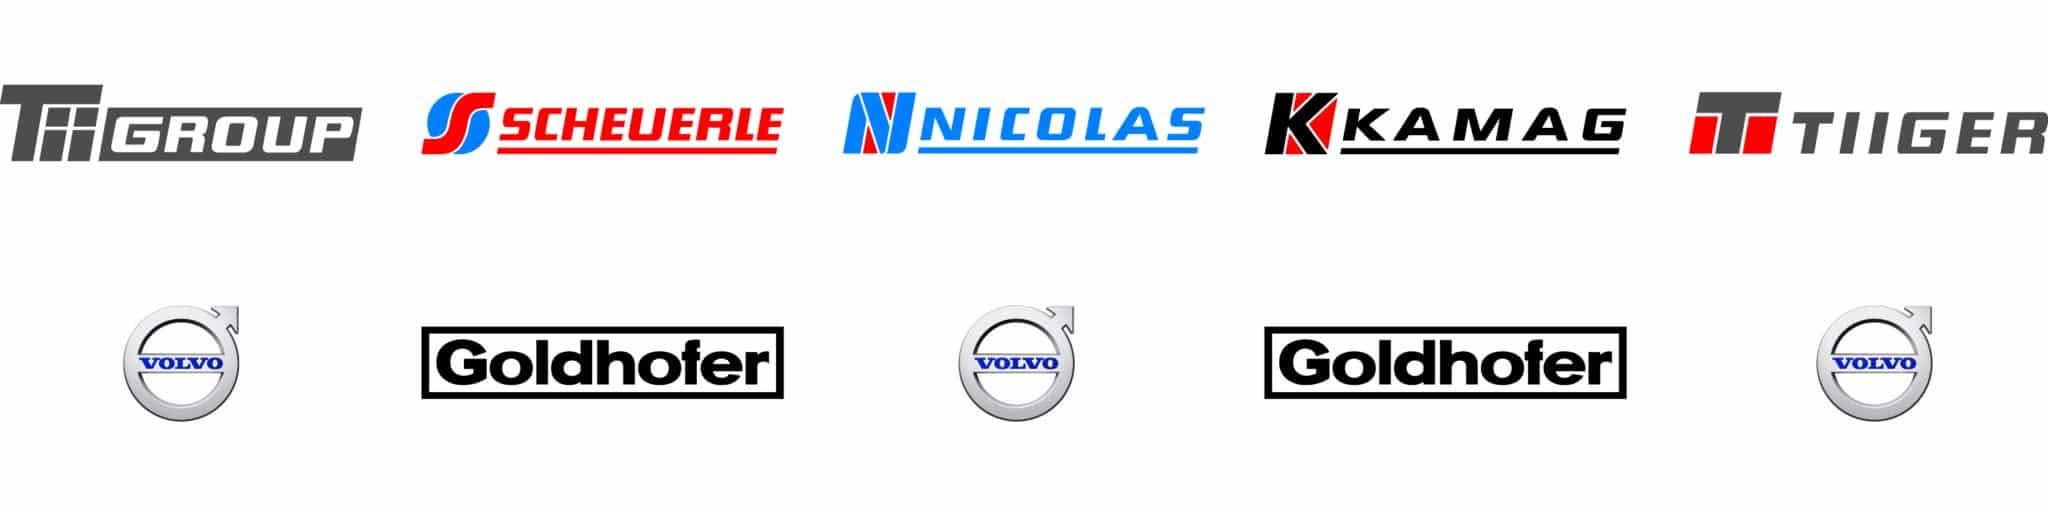 Heavies Headline Sponsor Logos